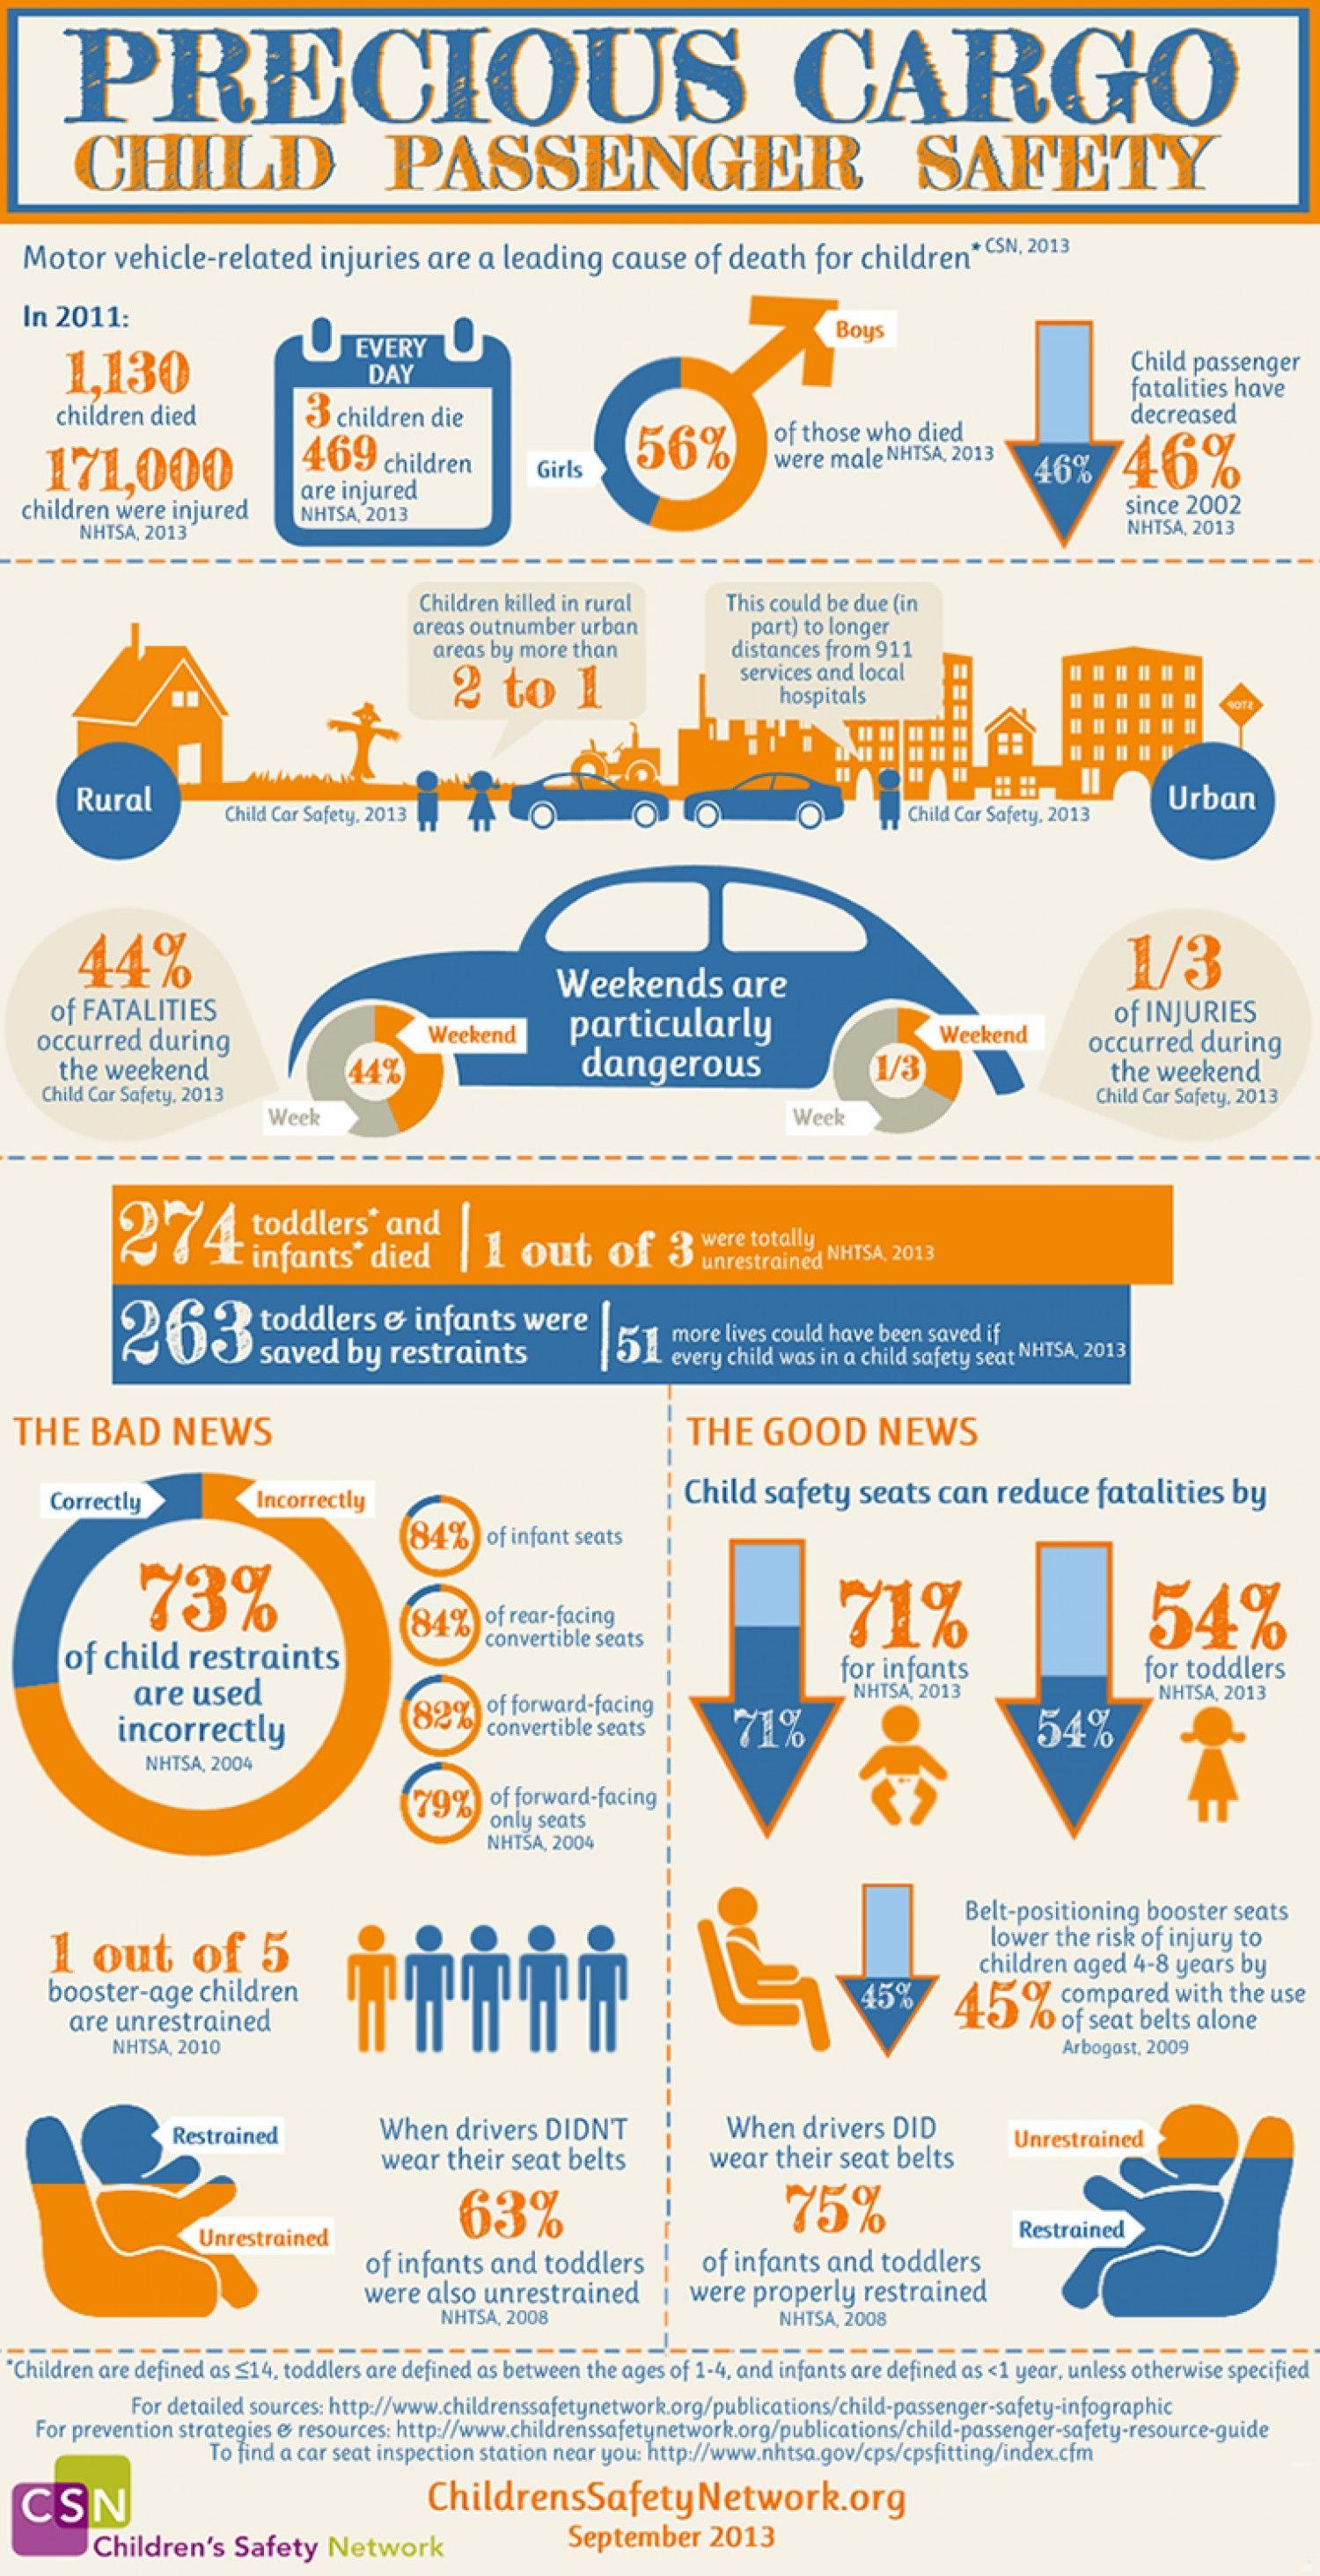 Precious Cargo Child Passenger Safety Infographic